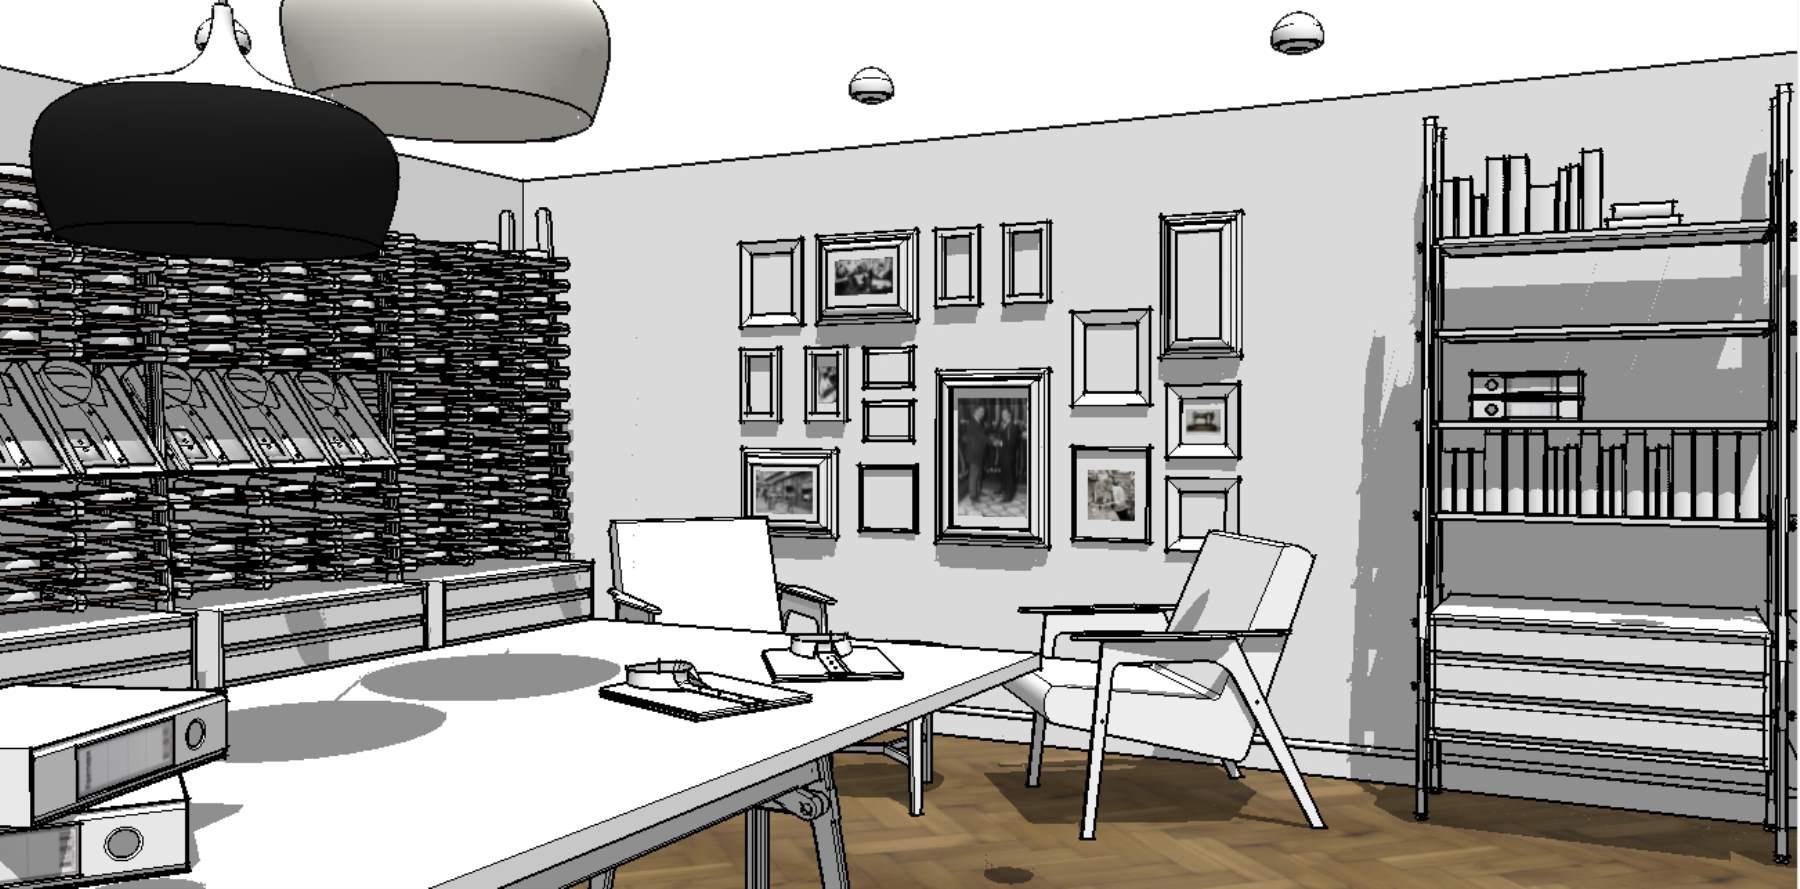 Braiconf magazin shop marriott mobilier lemn masiv furnir design dinamic003